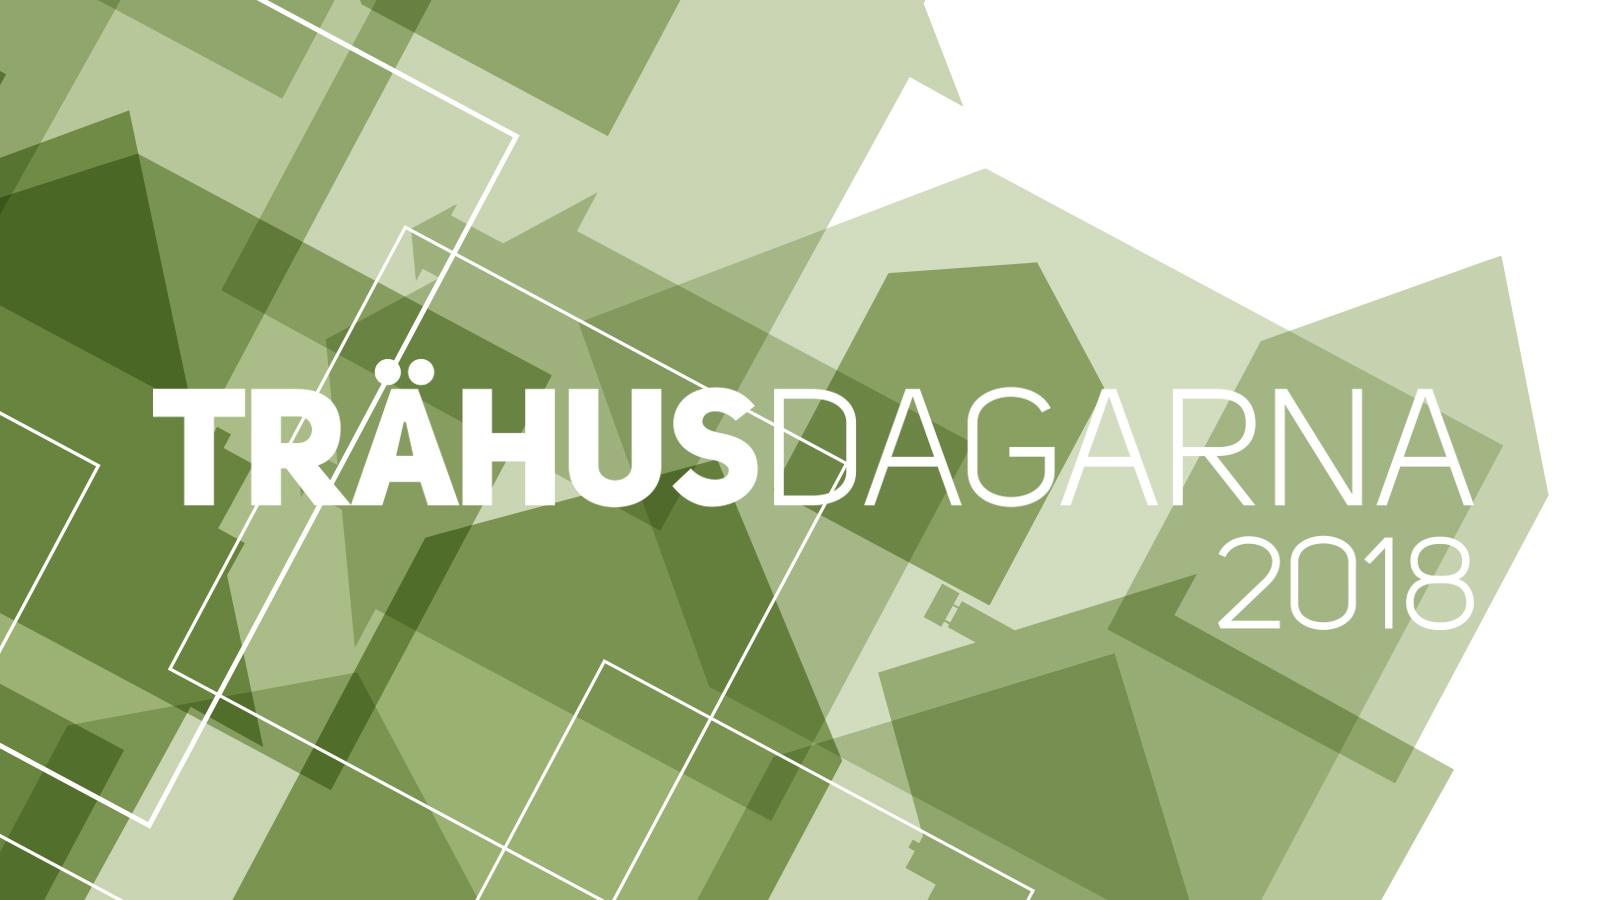 3076 Trahusdagarna webb 1600x900px logo